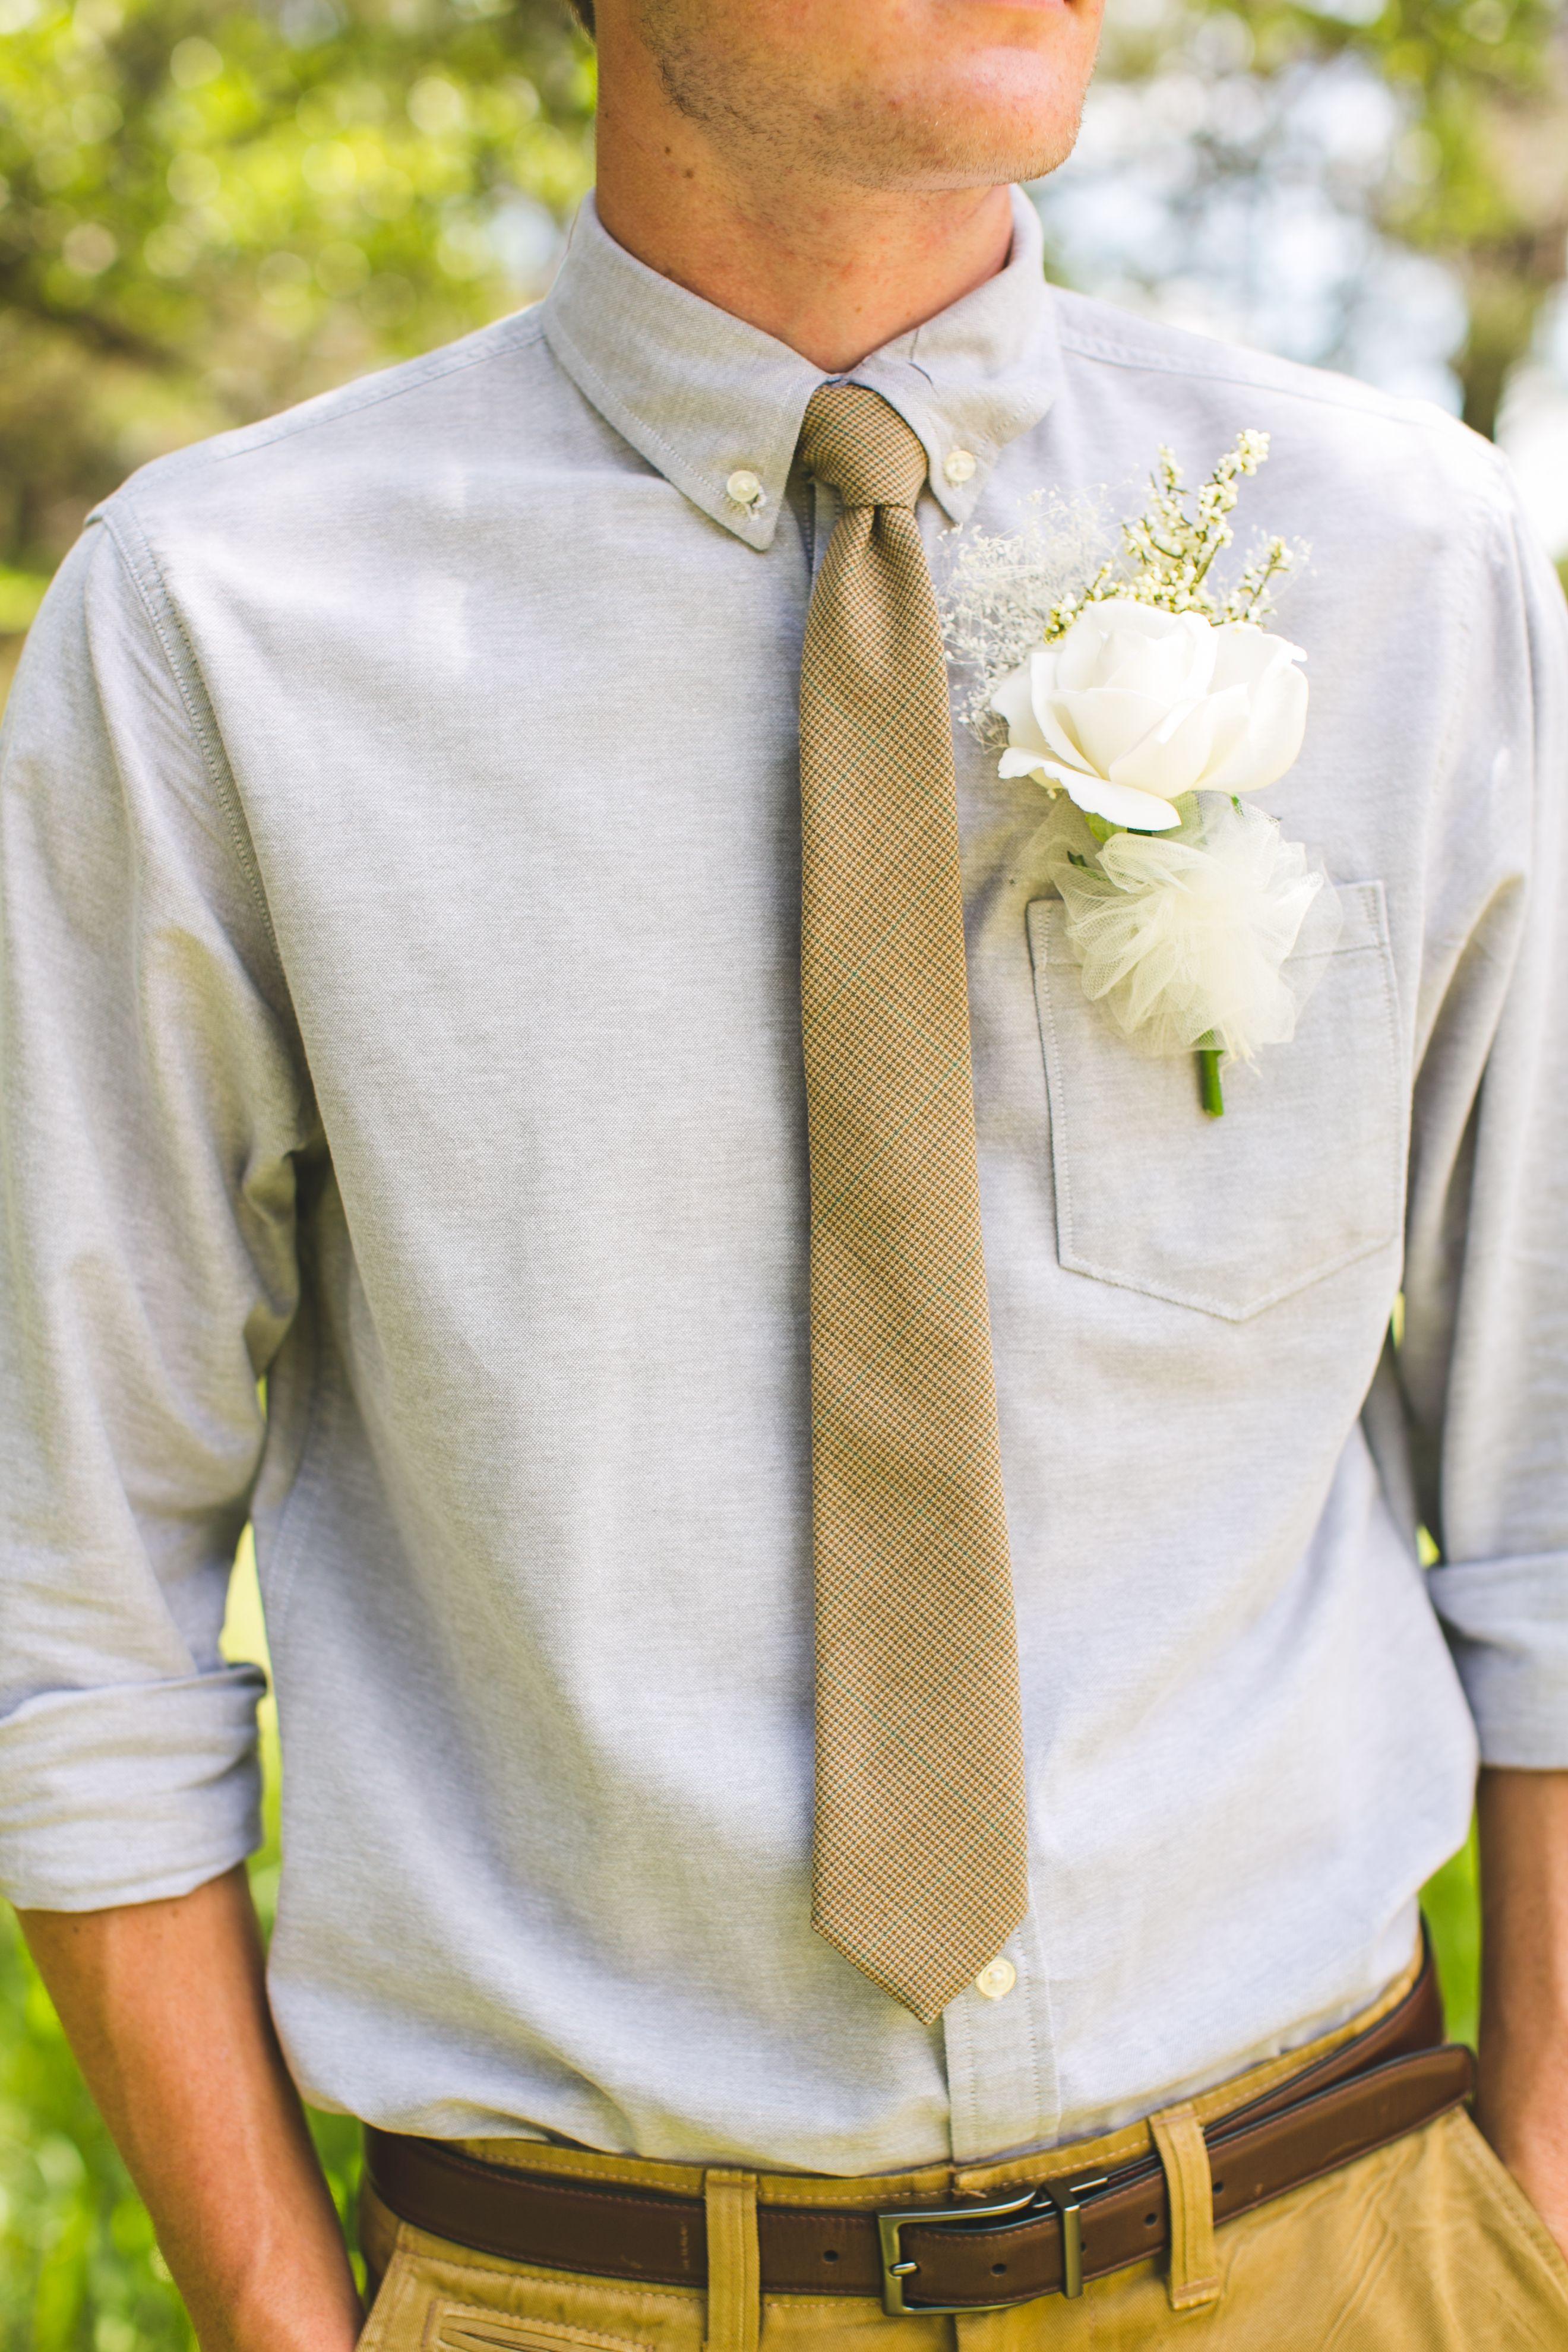 Casual men attire for outdoor wedding west texas wedding for Casual wedding dresses for man